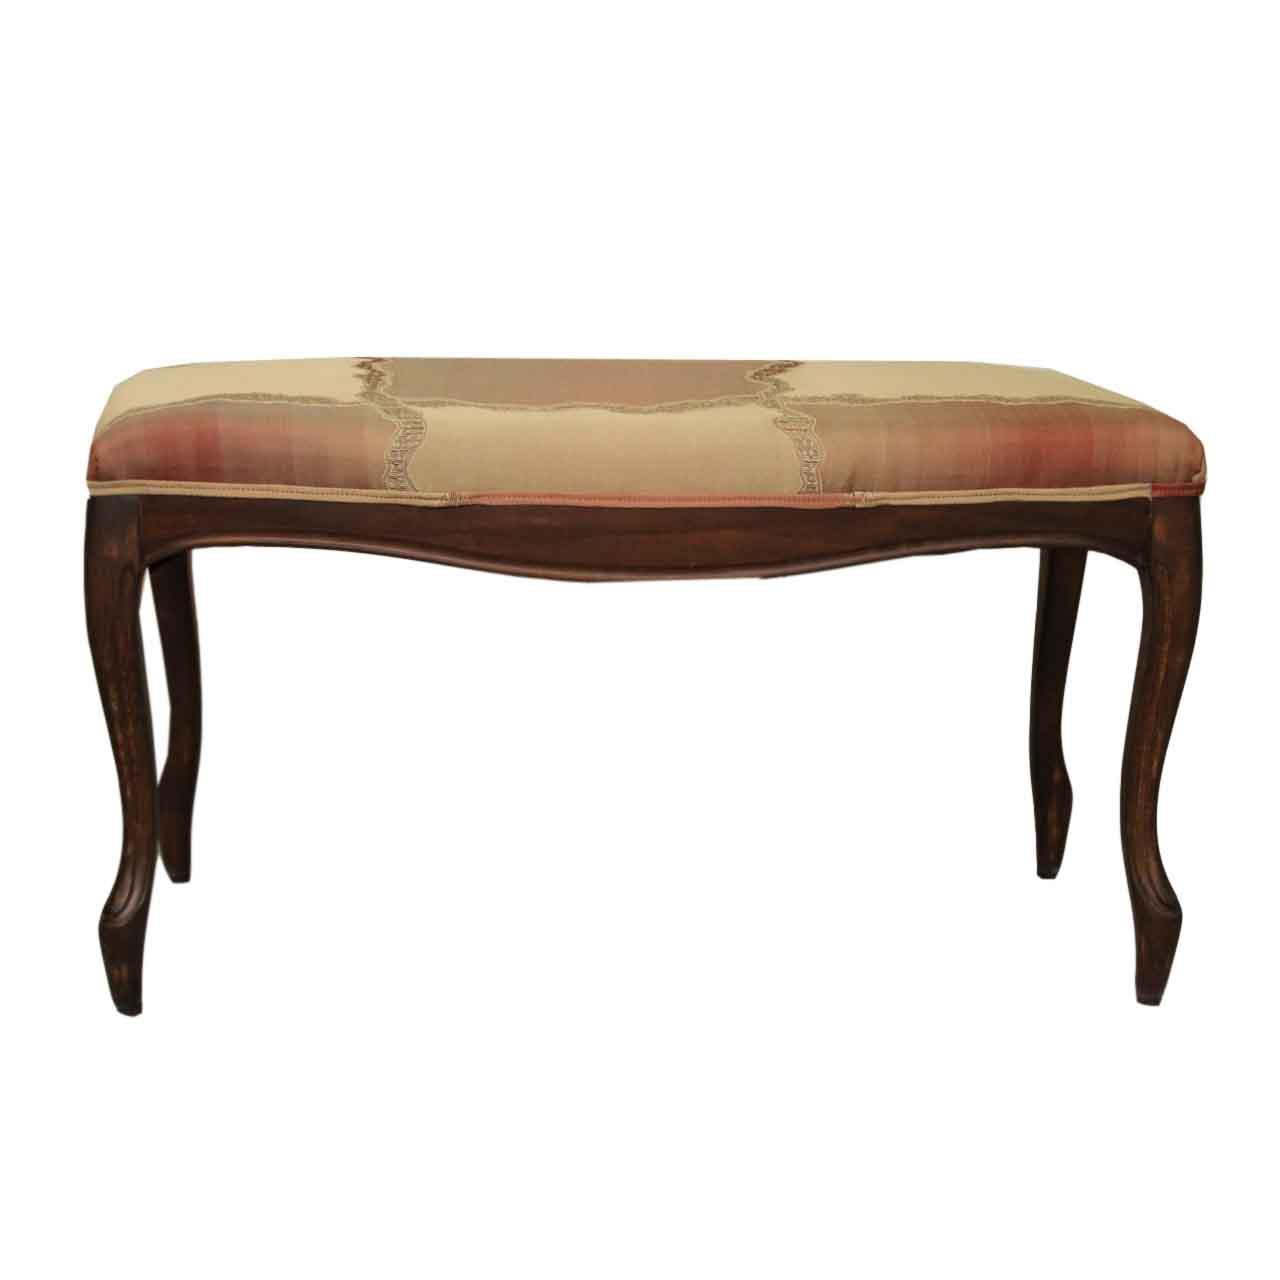 Bancheta vintage Carmen din lemn maro cu tapiterie 90x66x50 cm chicville 2021